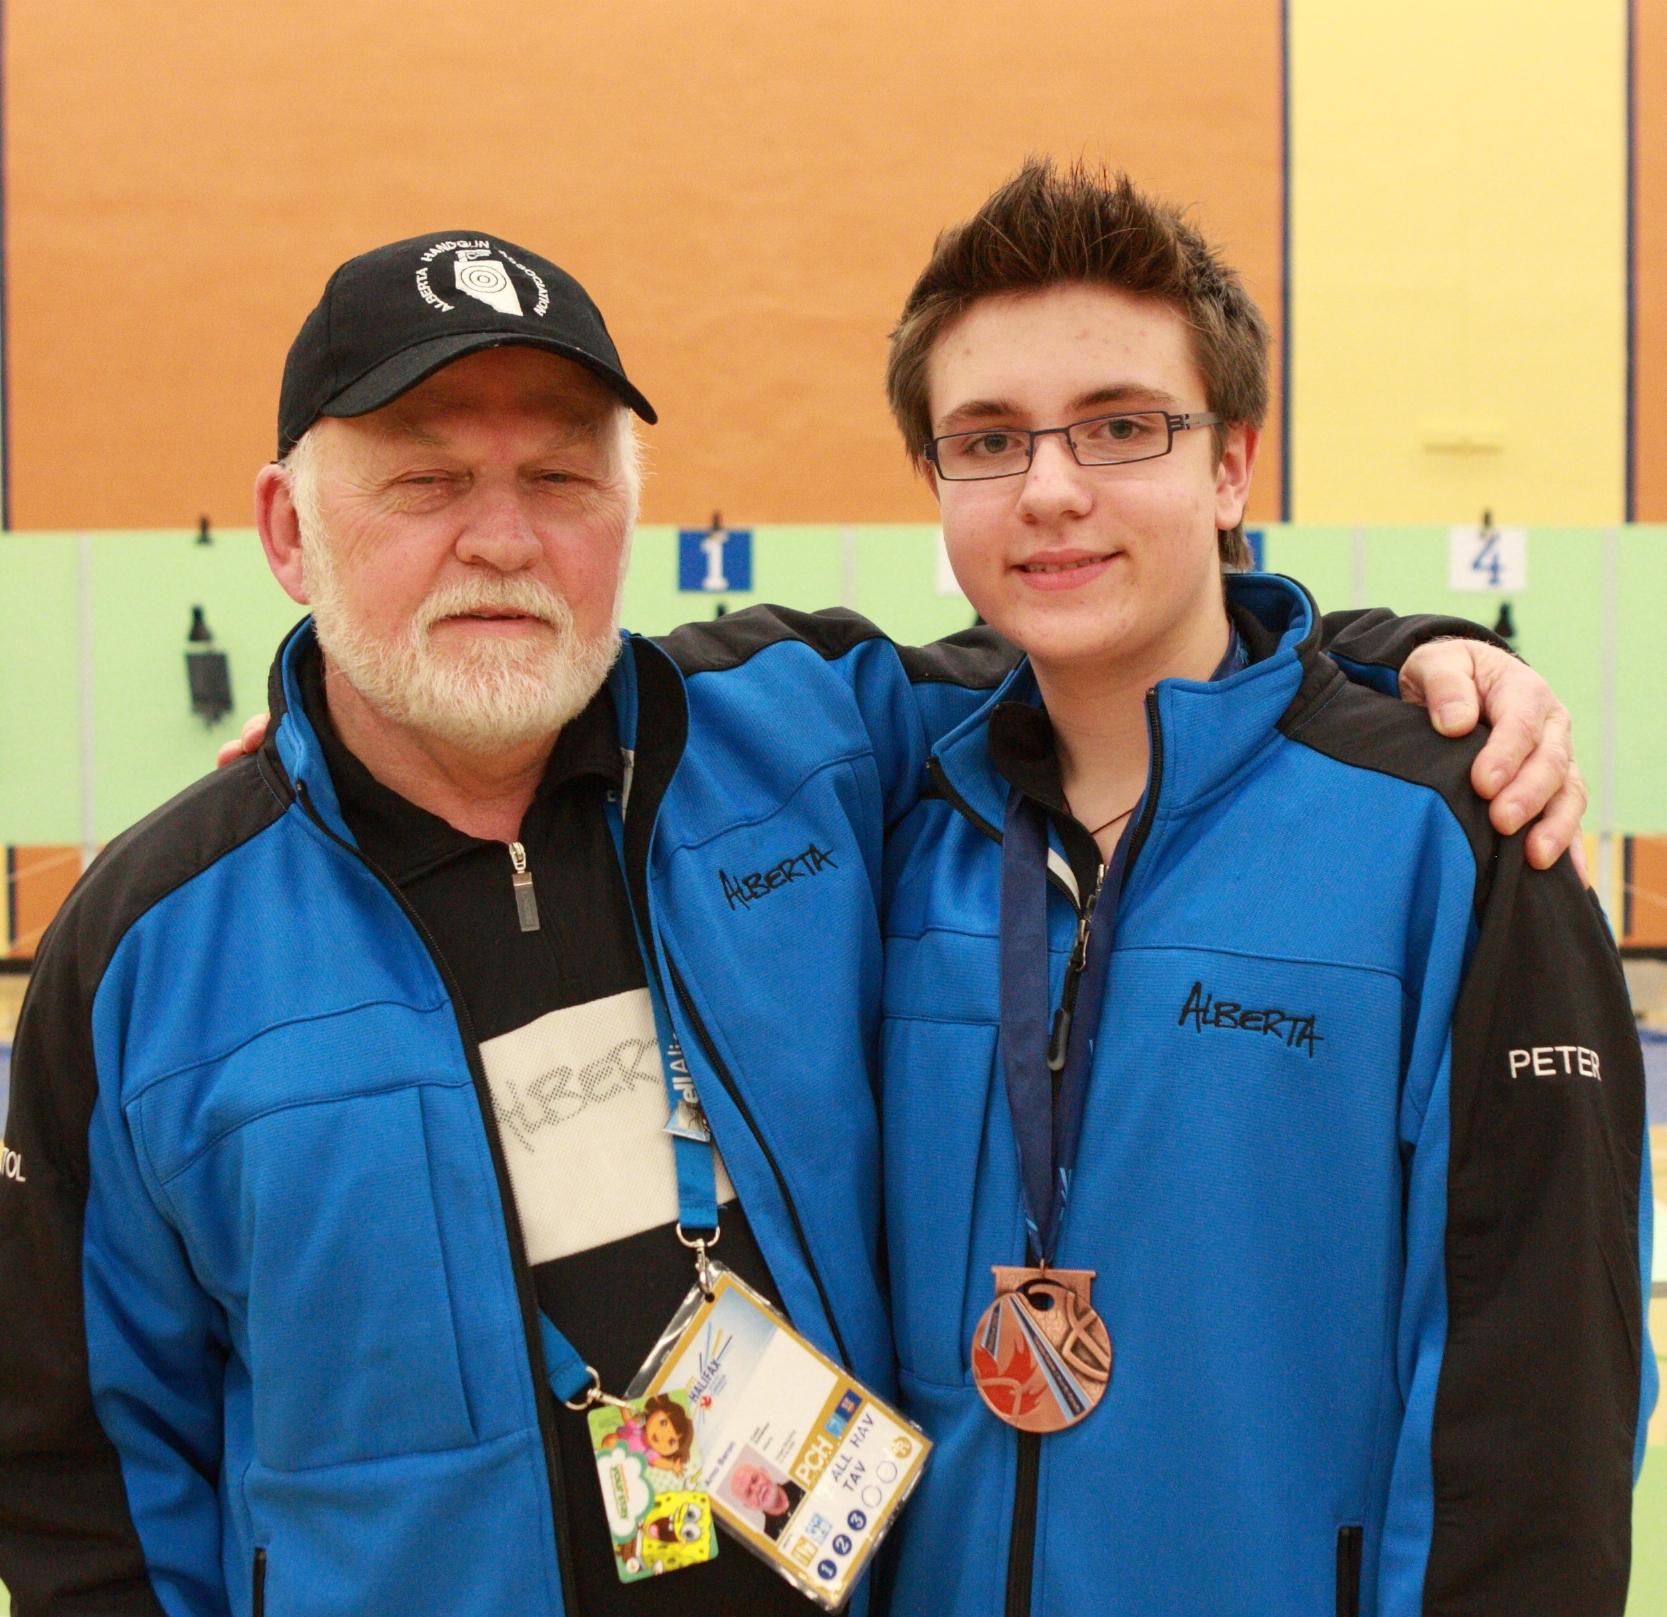 2011 Canada Winter Games, Halifax, NS Coach Arno Baron, Peter Schulze (Bronze - AP60 Team, Bronze - AP60 Individual)